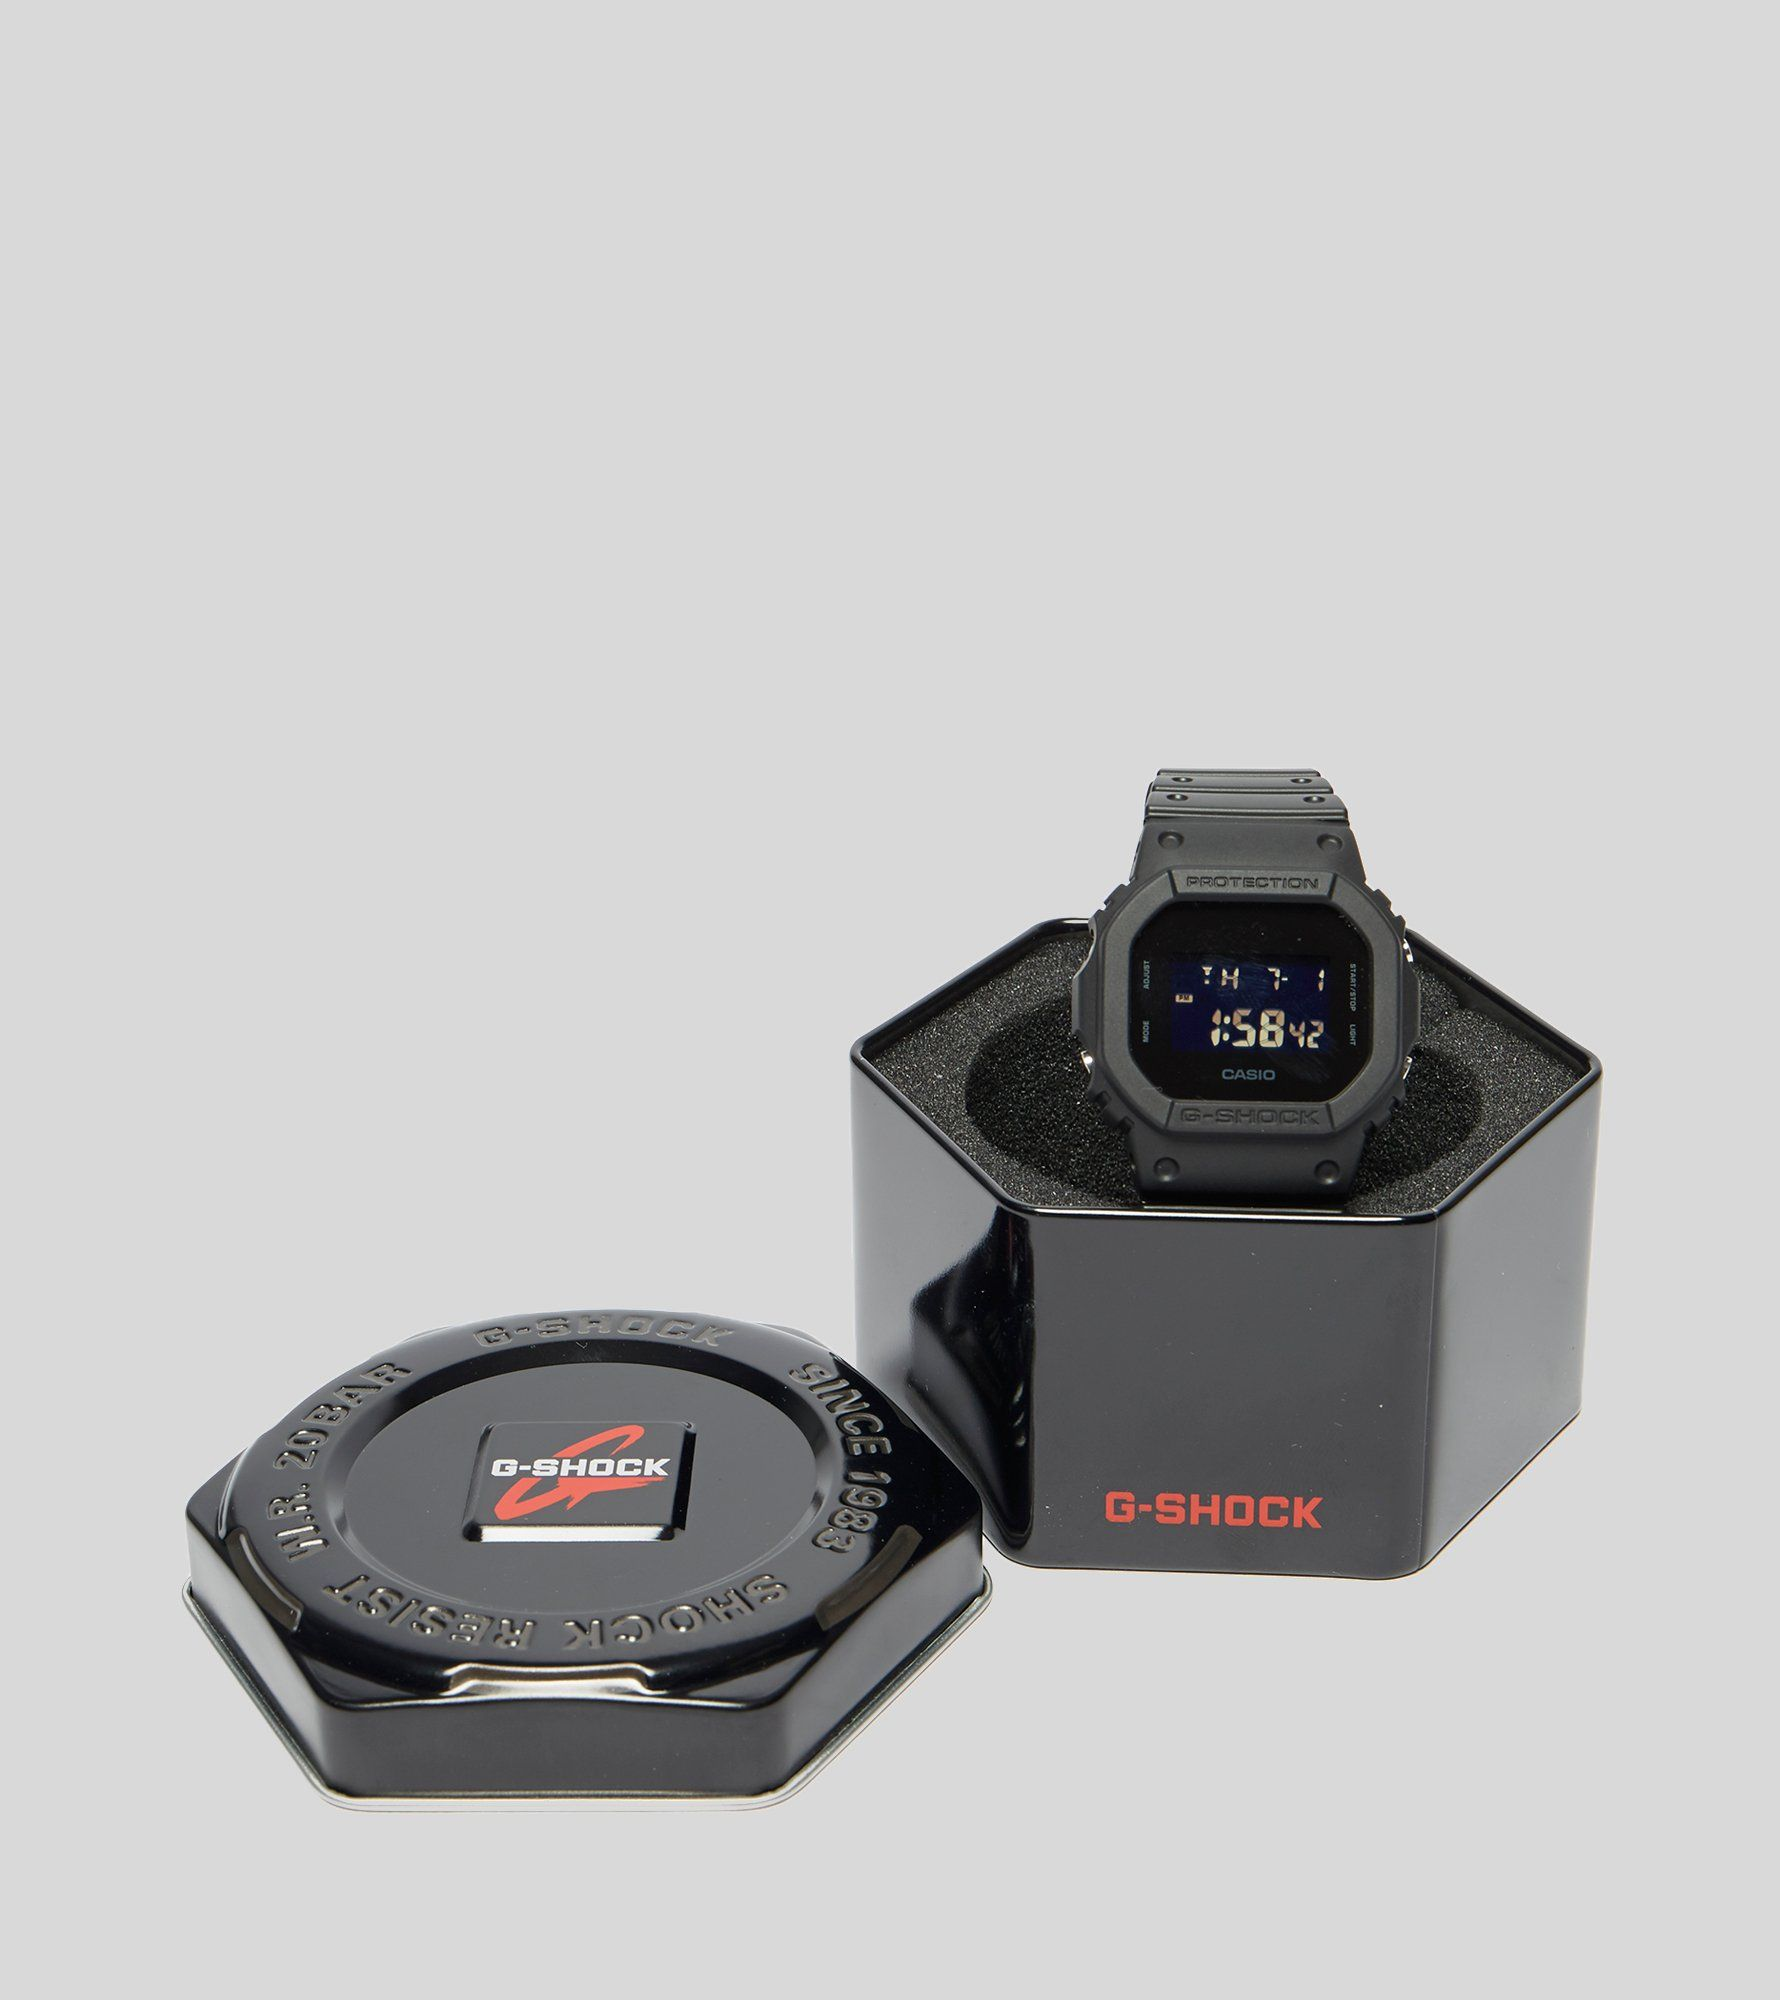 G-Shock DW-5600BB